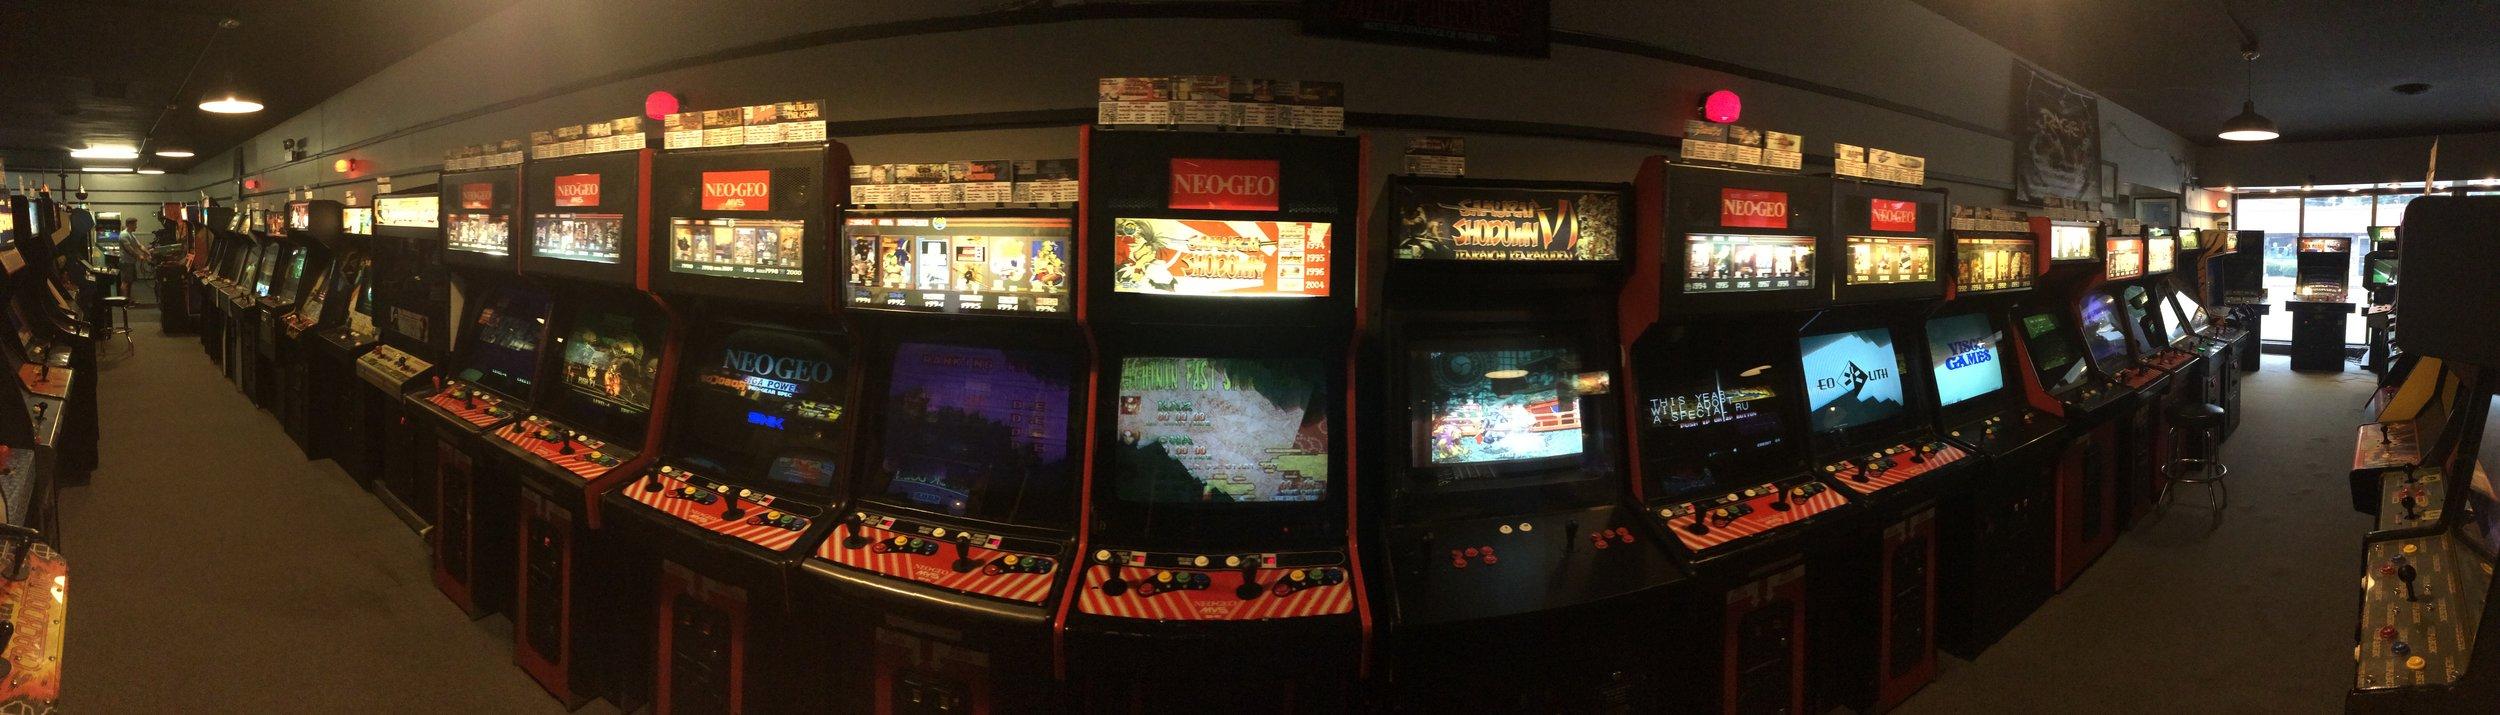 Neo-Geo section.